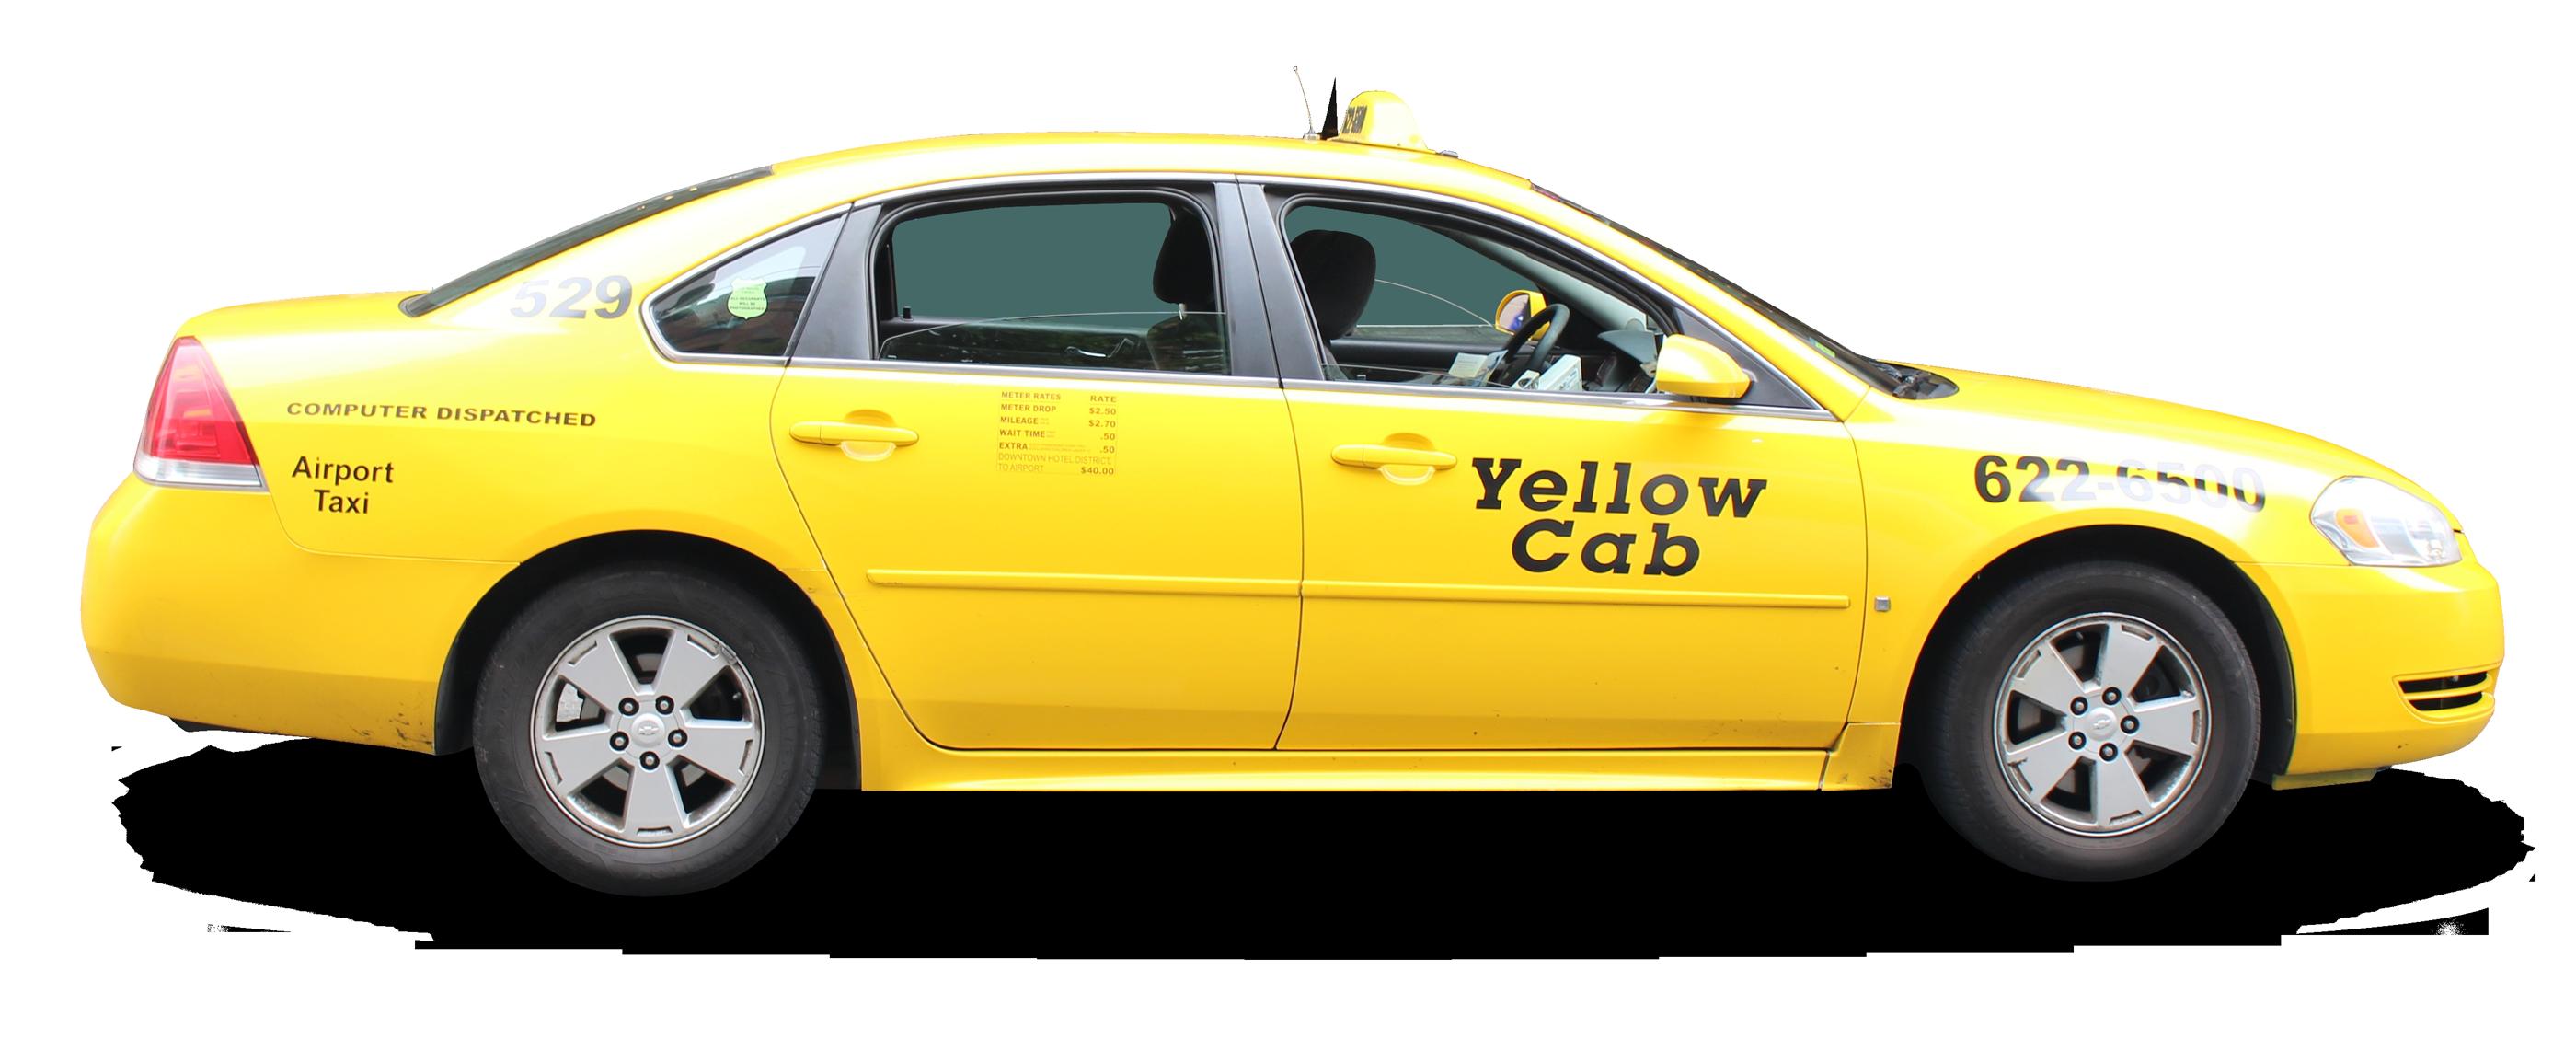 Taxi Cab Png Image Taxi Taxi Cab Yellow Taxi